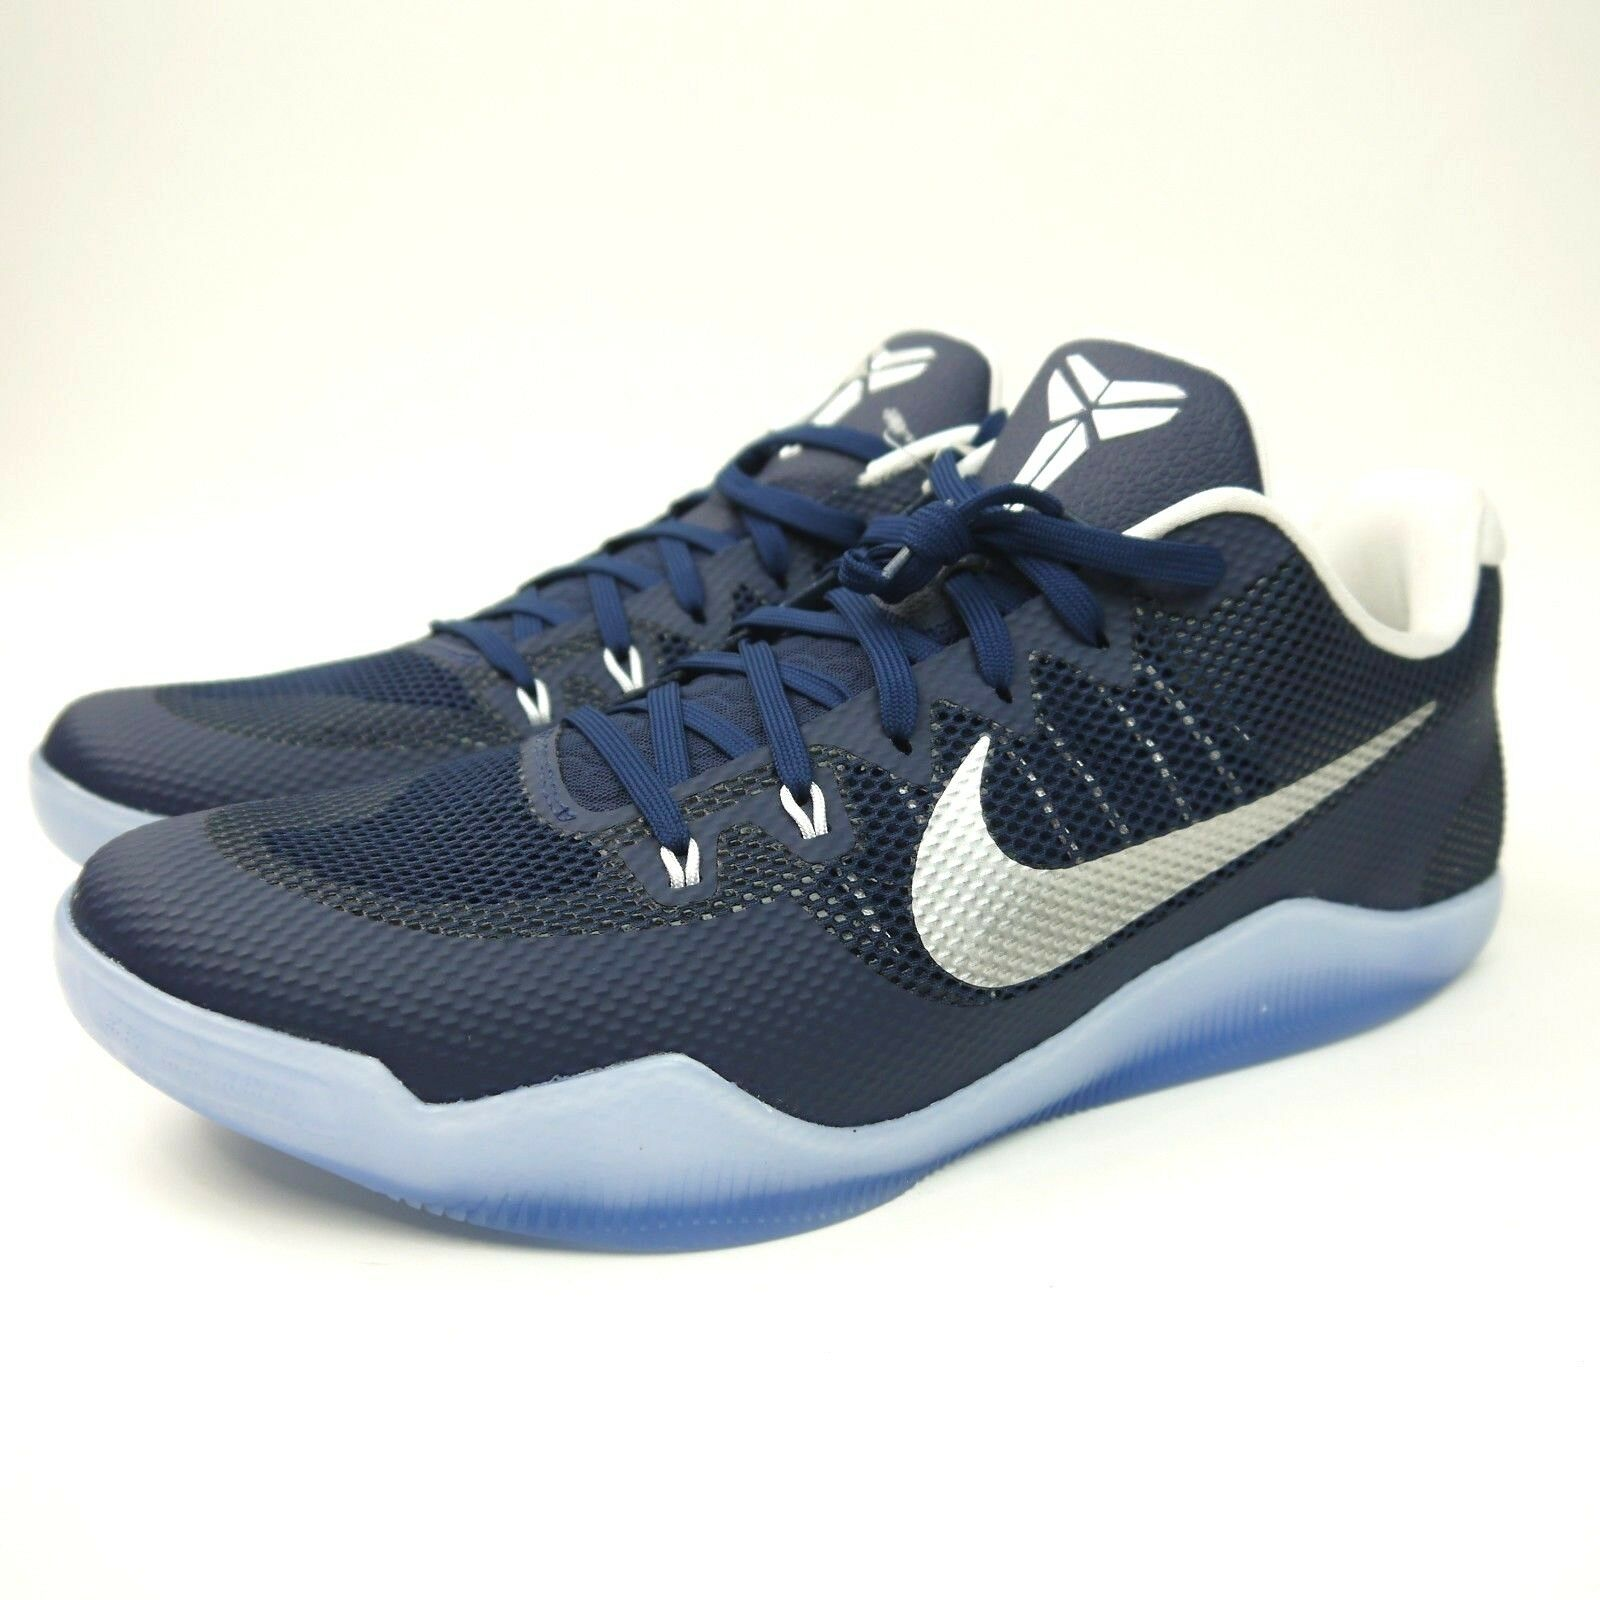 58845b6706d86d NEW Nike Kobe XI 11 TB PROMO 856485-442 White Navy Icy White Navy ...